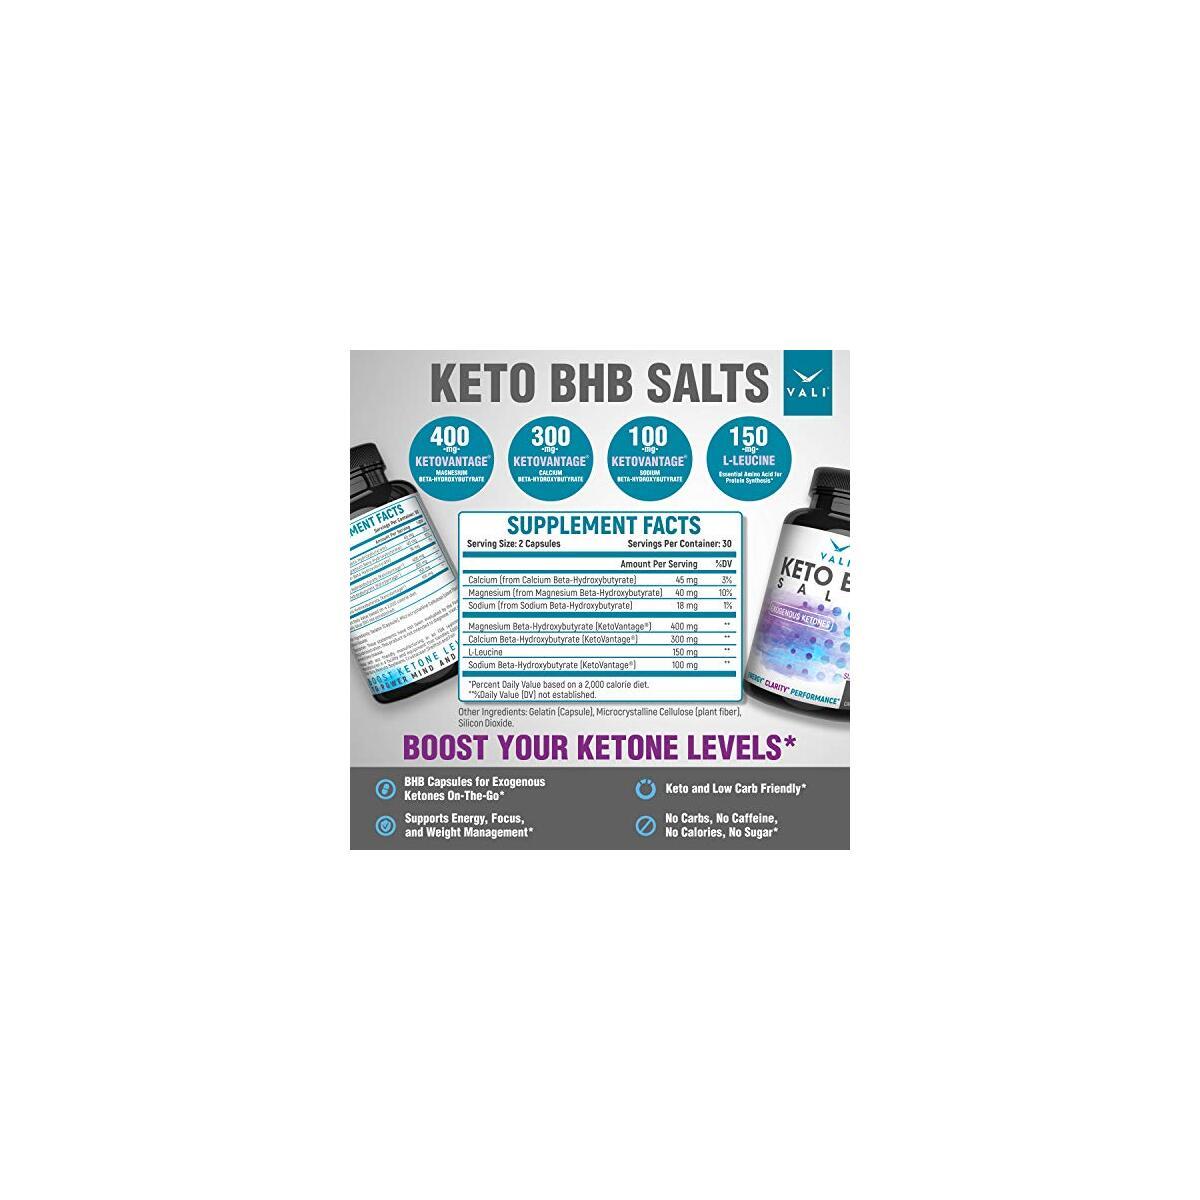 VALI Keto BHB Salt Pills Exogenous Ketones Capsules - Support for Ketogenic Low Carb Diet